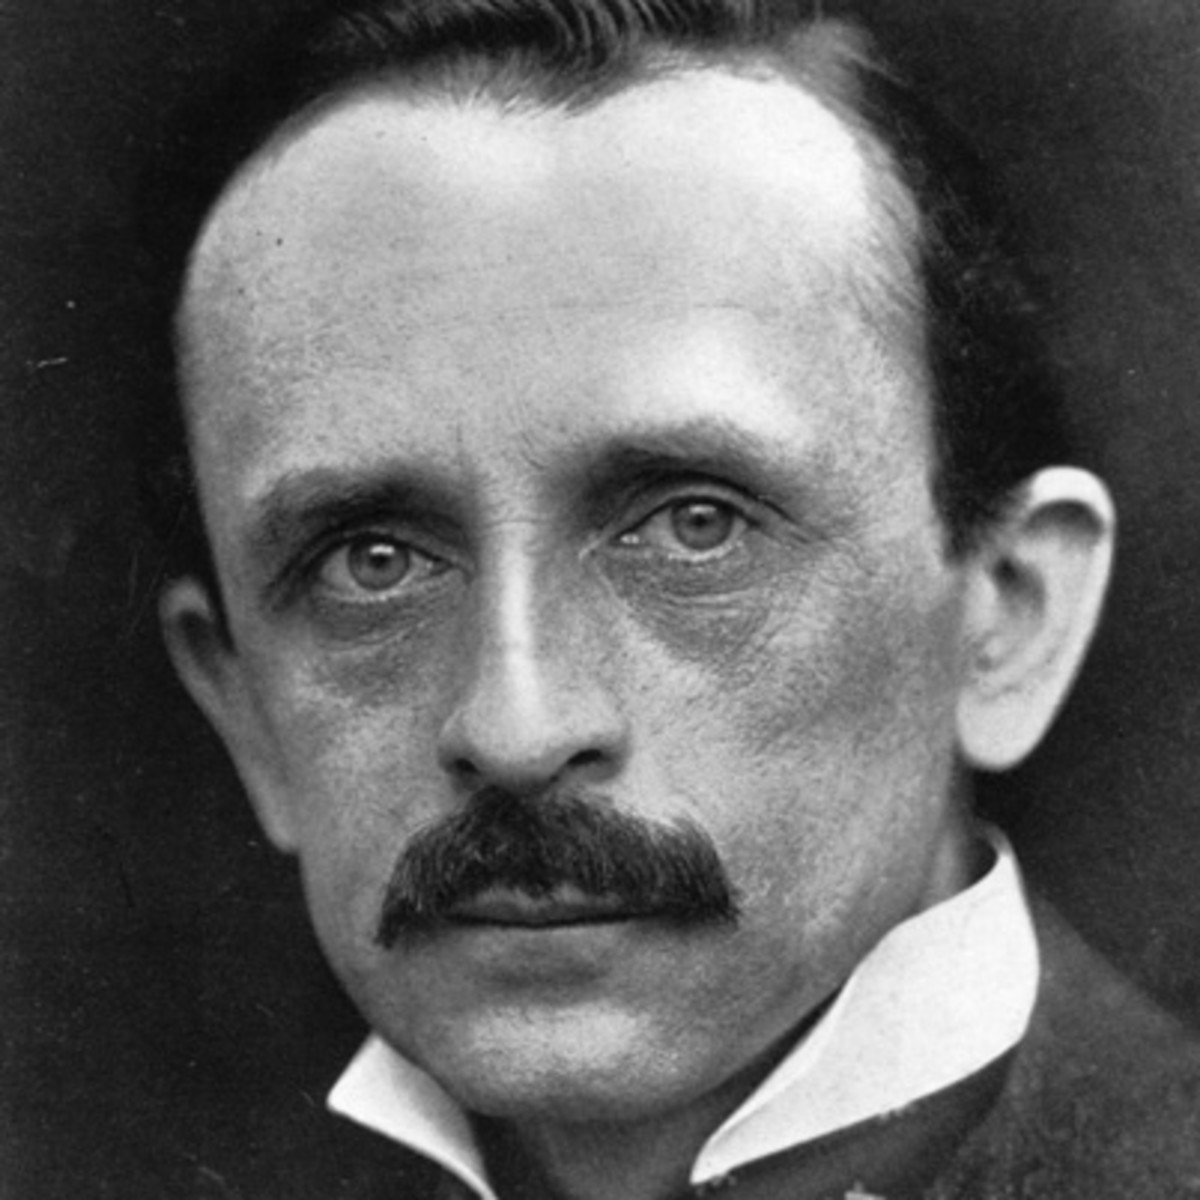 J.M. Barrıe